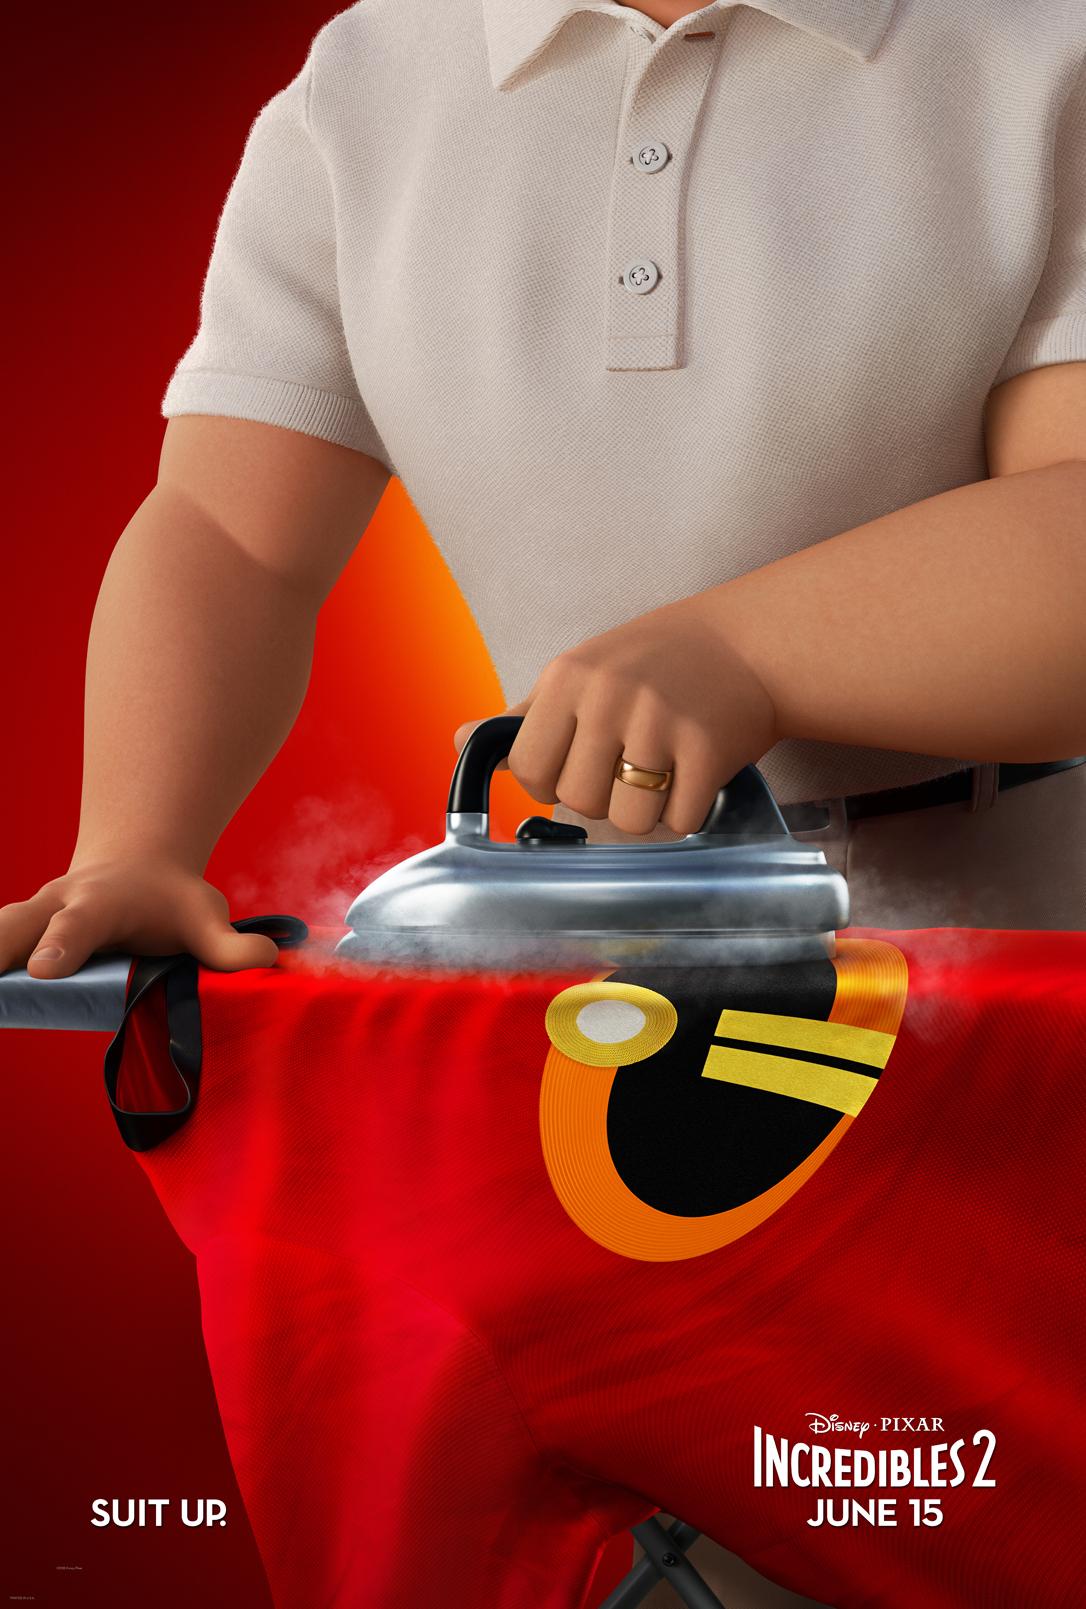 Incredibles II Trailer, Incredibles 2, Incredibles 2 trailer, Incredibles II sneak peek